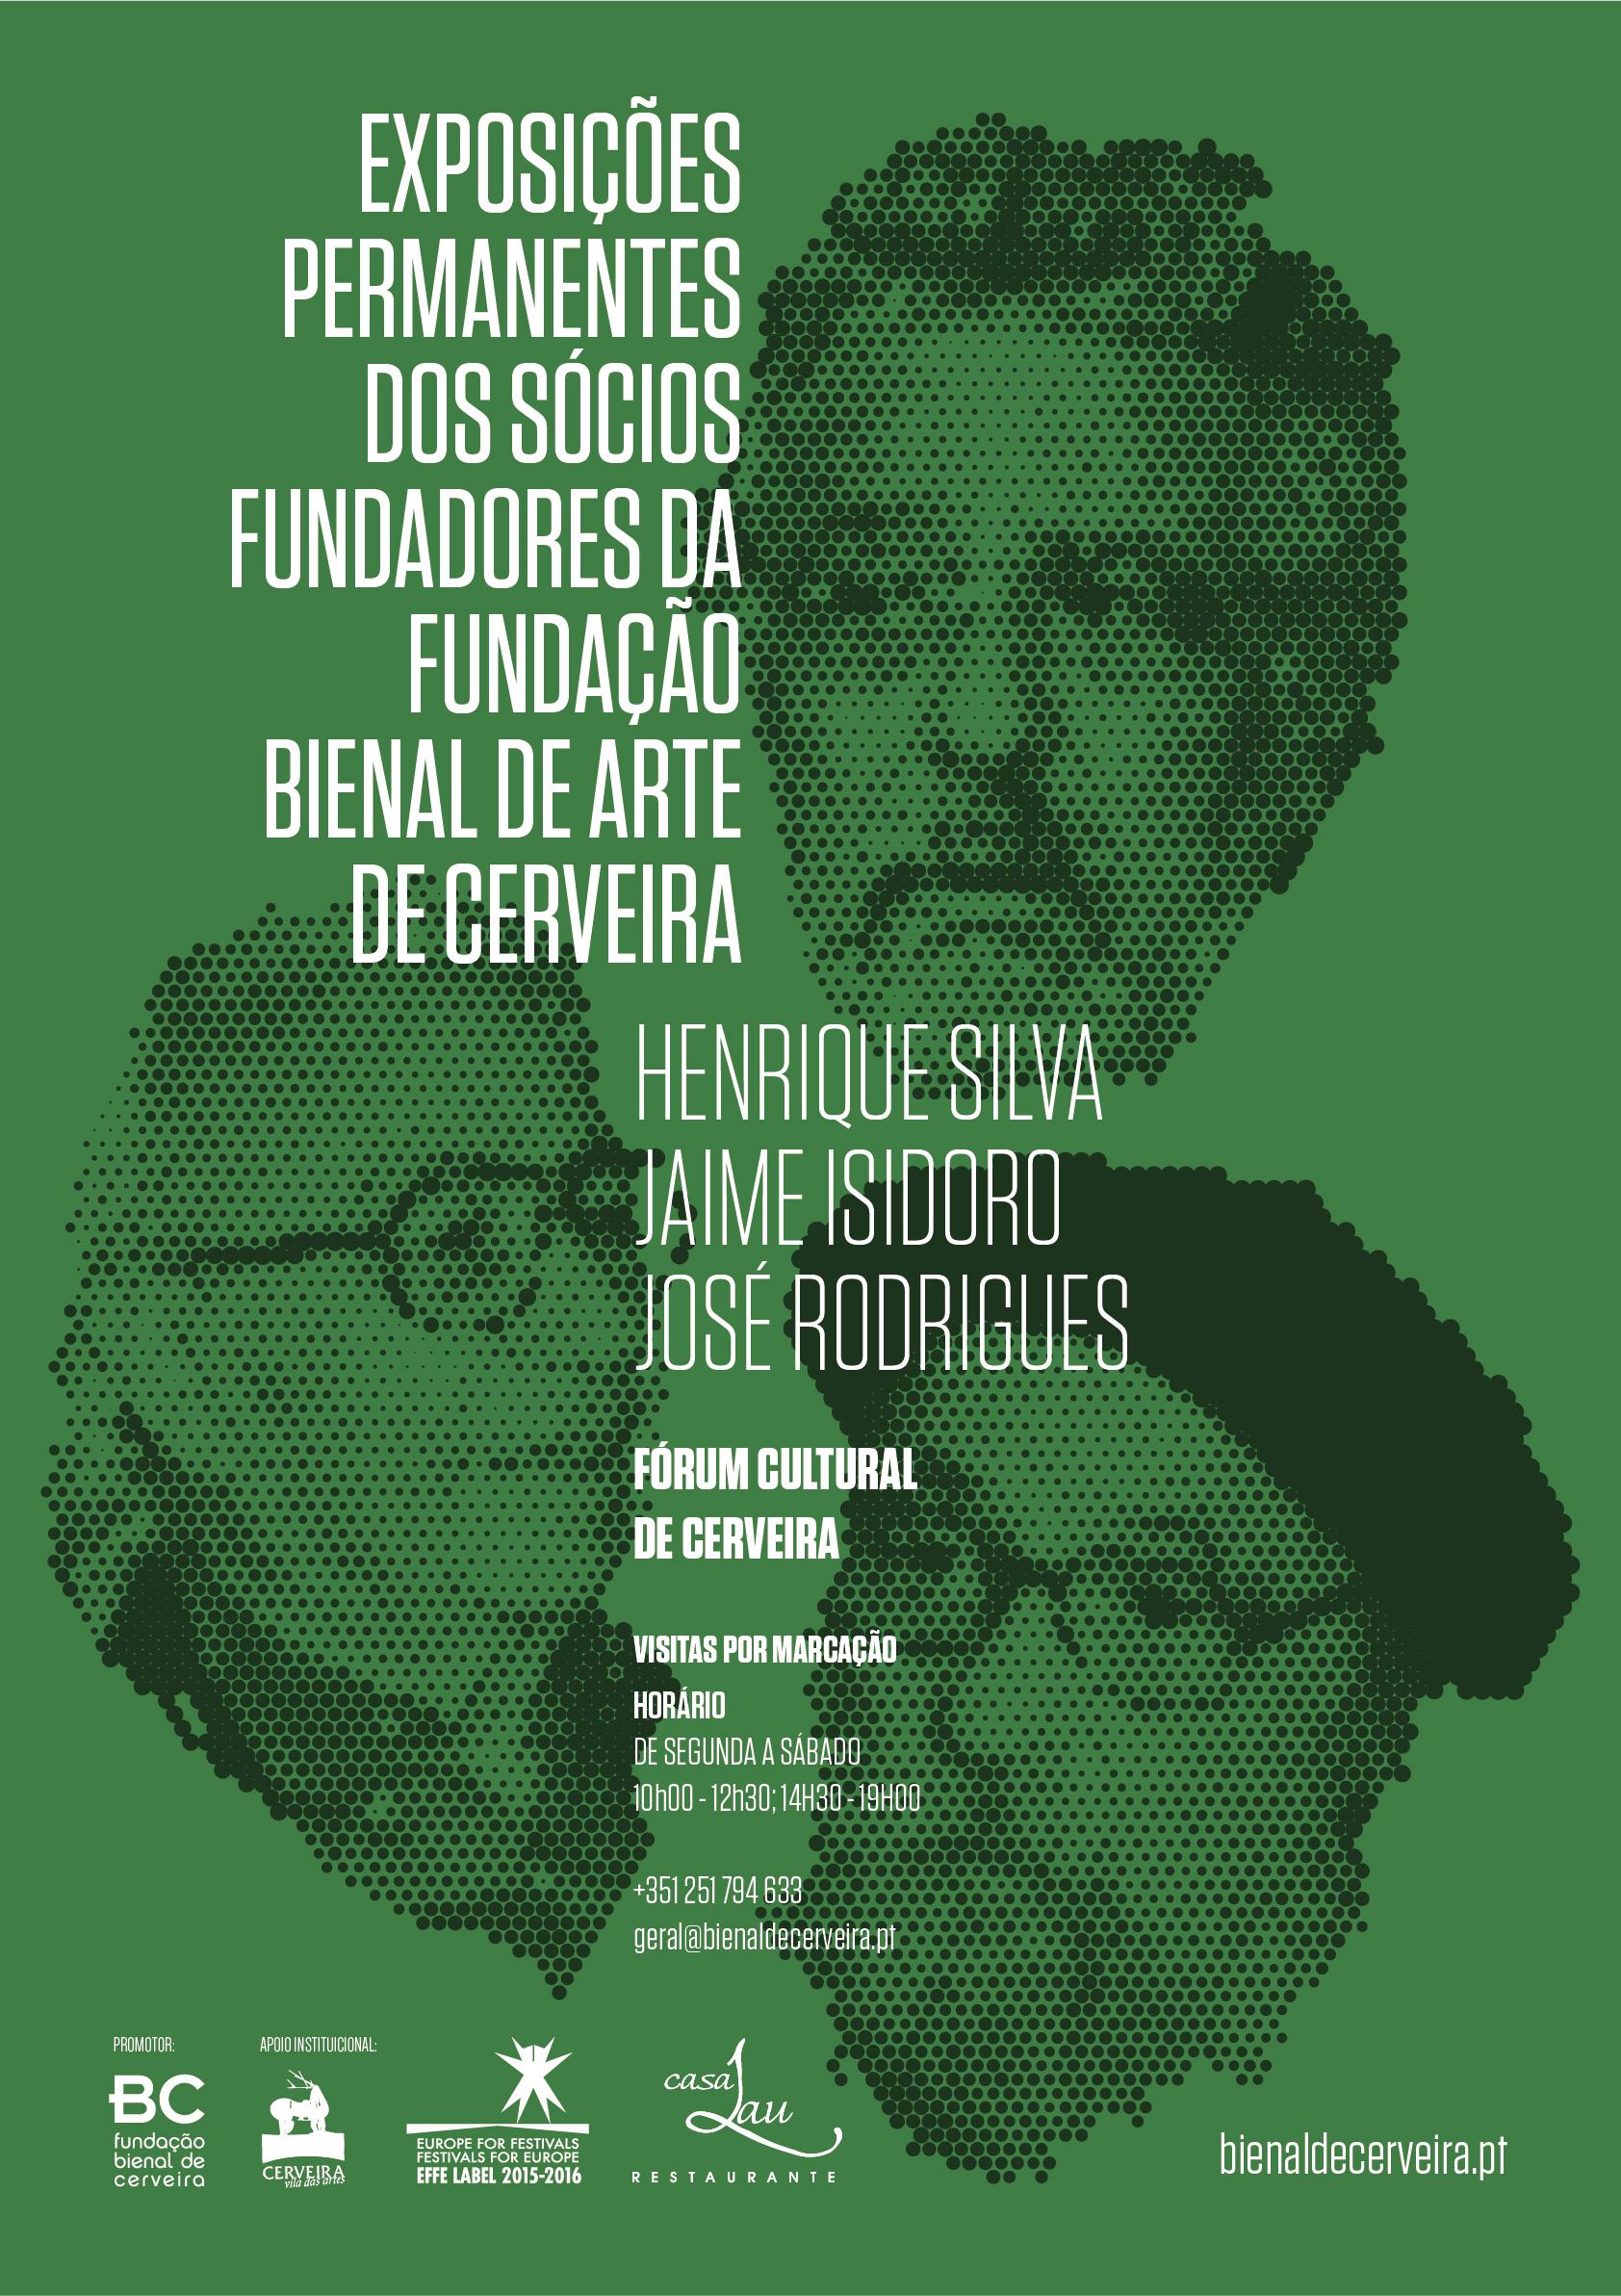 cartaz_exposicoes_permanentes